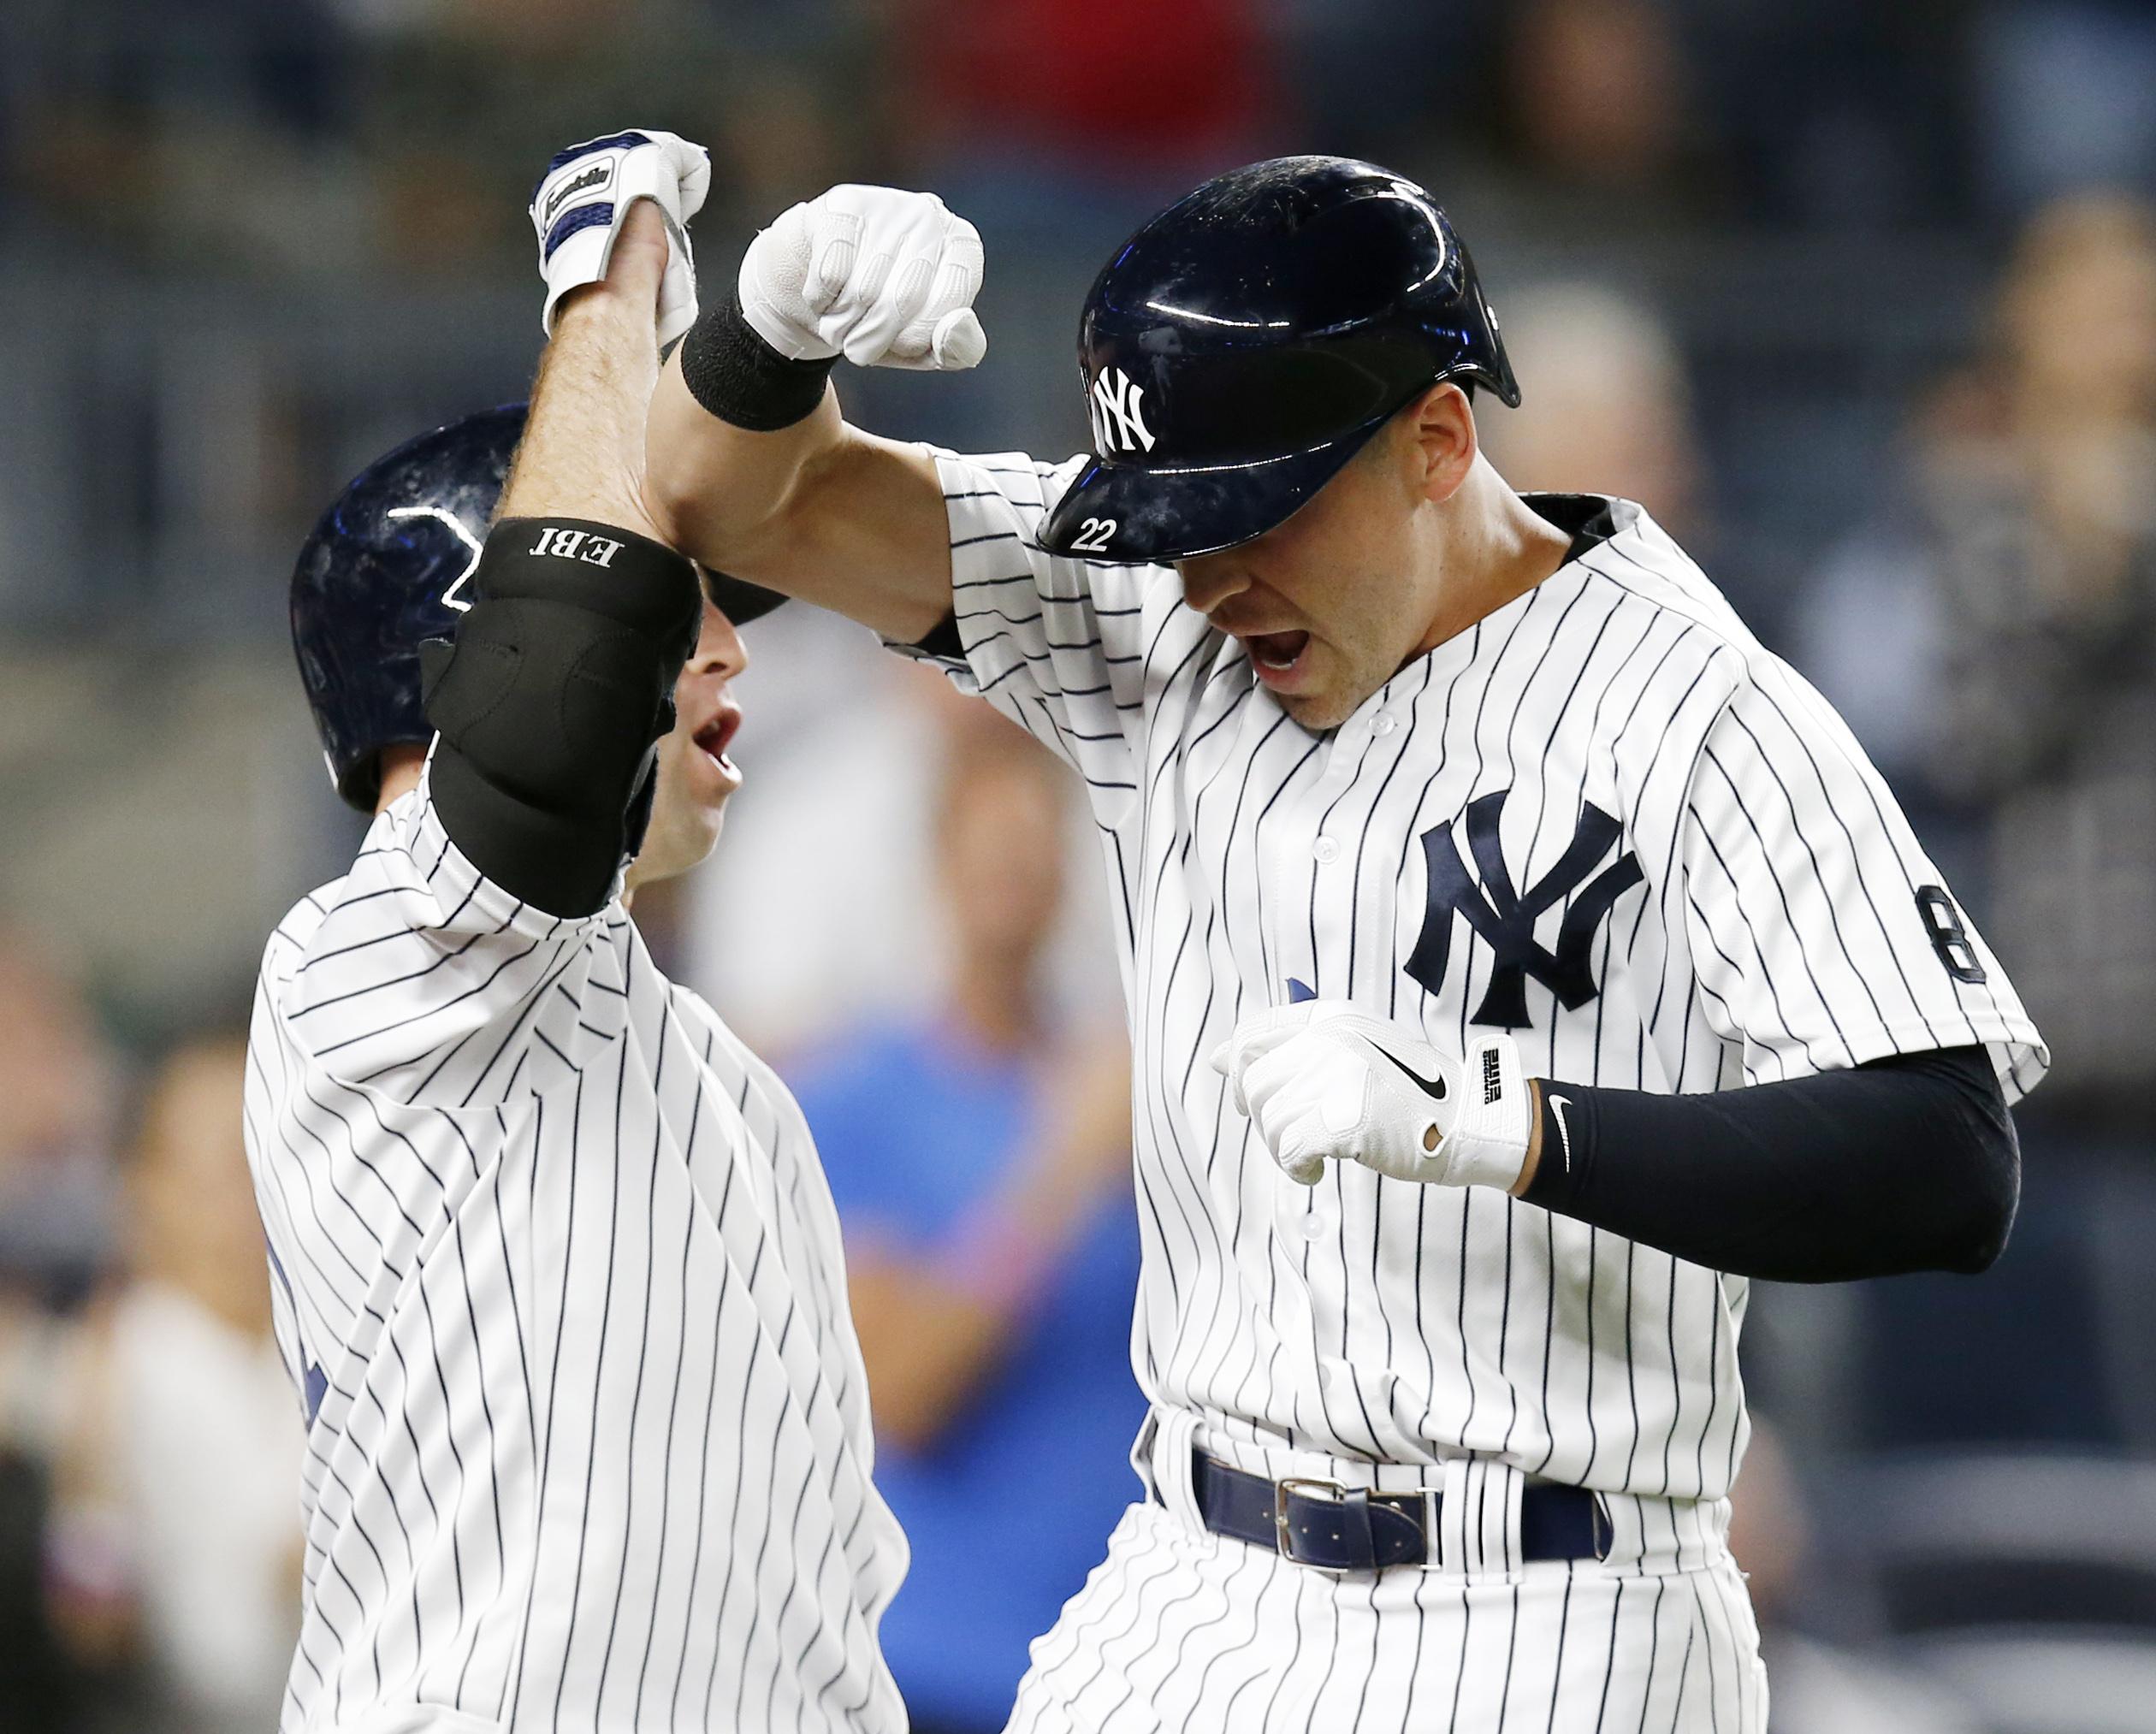 New York Yankees' Brett Gardner, left, celebrates with pinch-hitter Jacoby Ellsbury after Ellsbury' seventh-inning solo home run in New York, Tuesday, Sept. 13, 2016. (AP Photo/Kathy Willens)